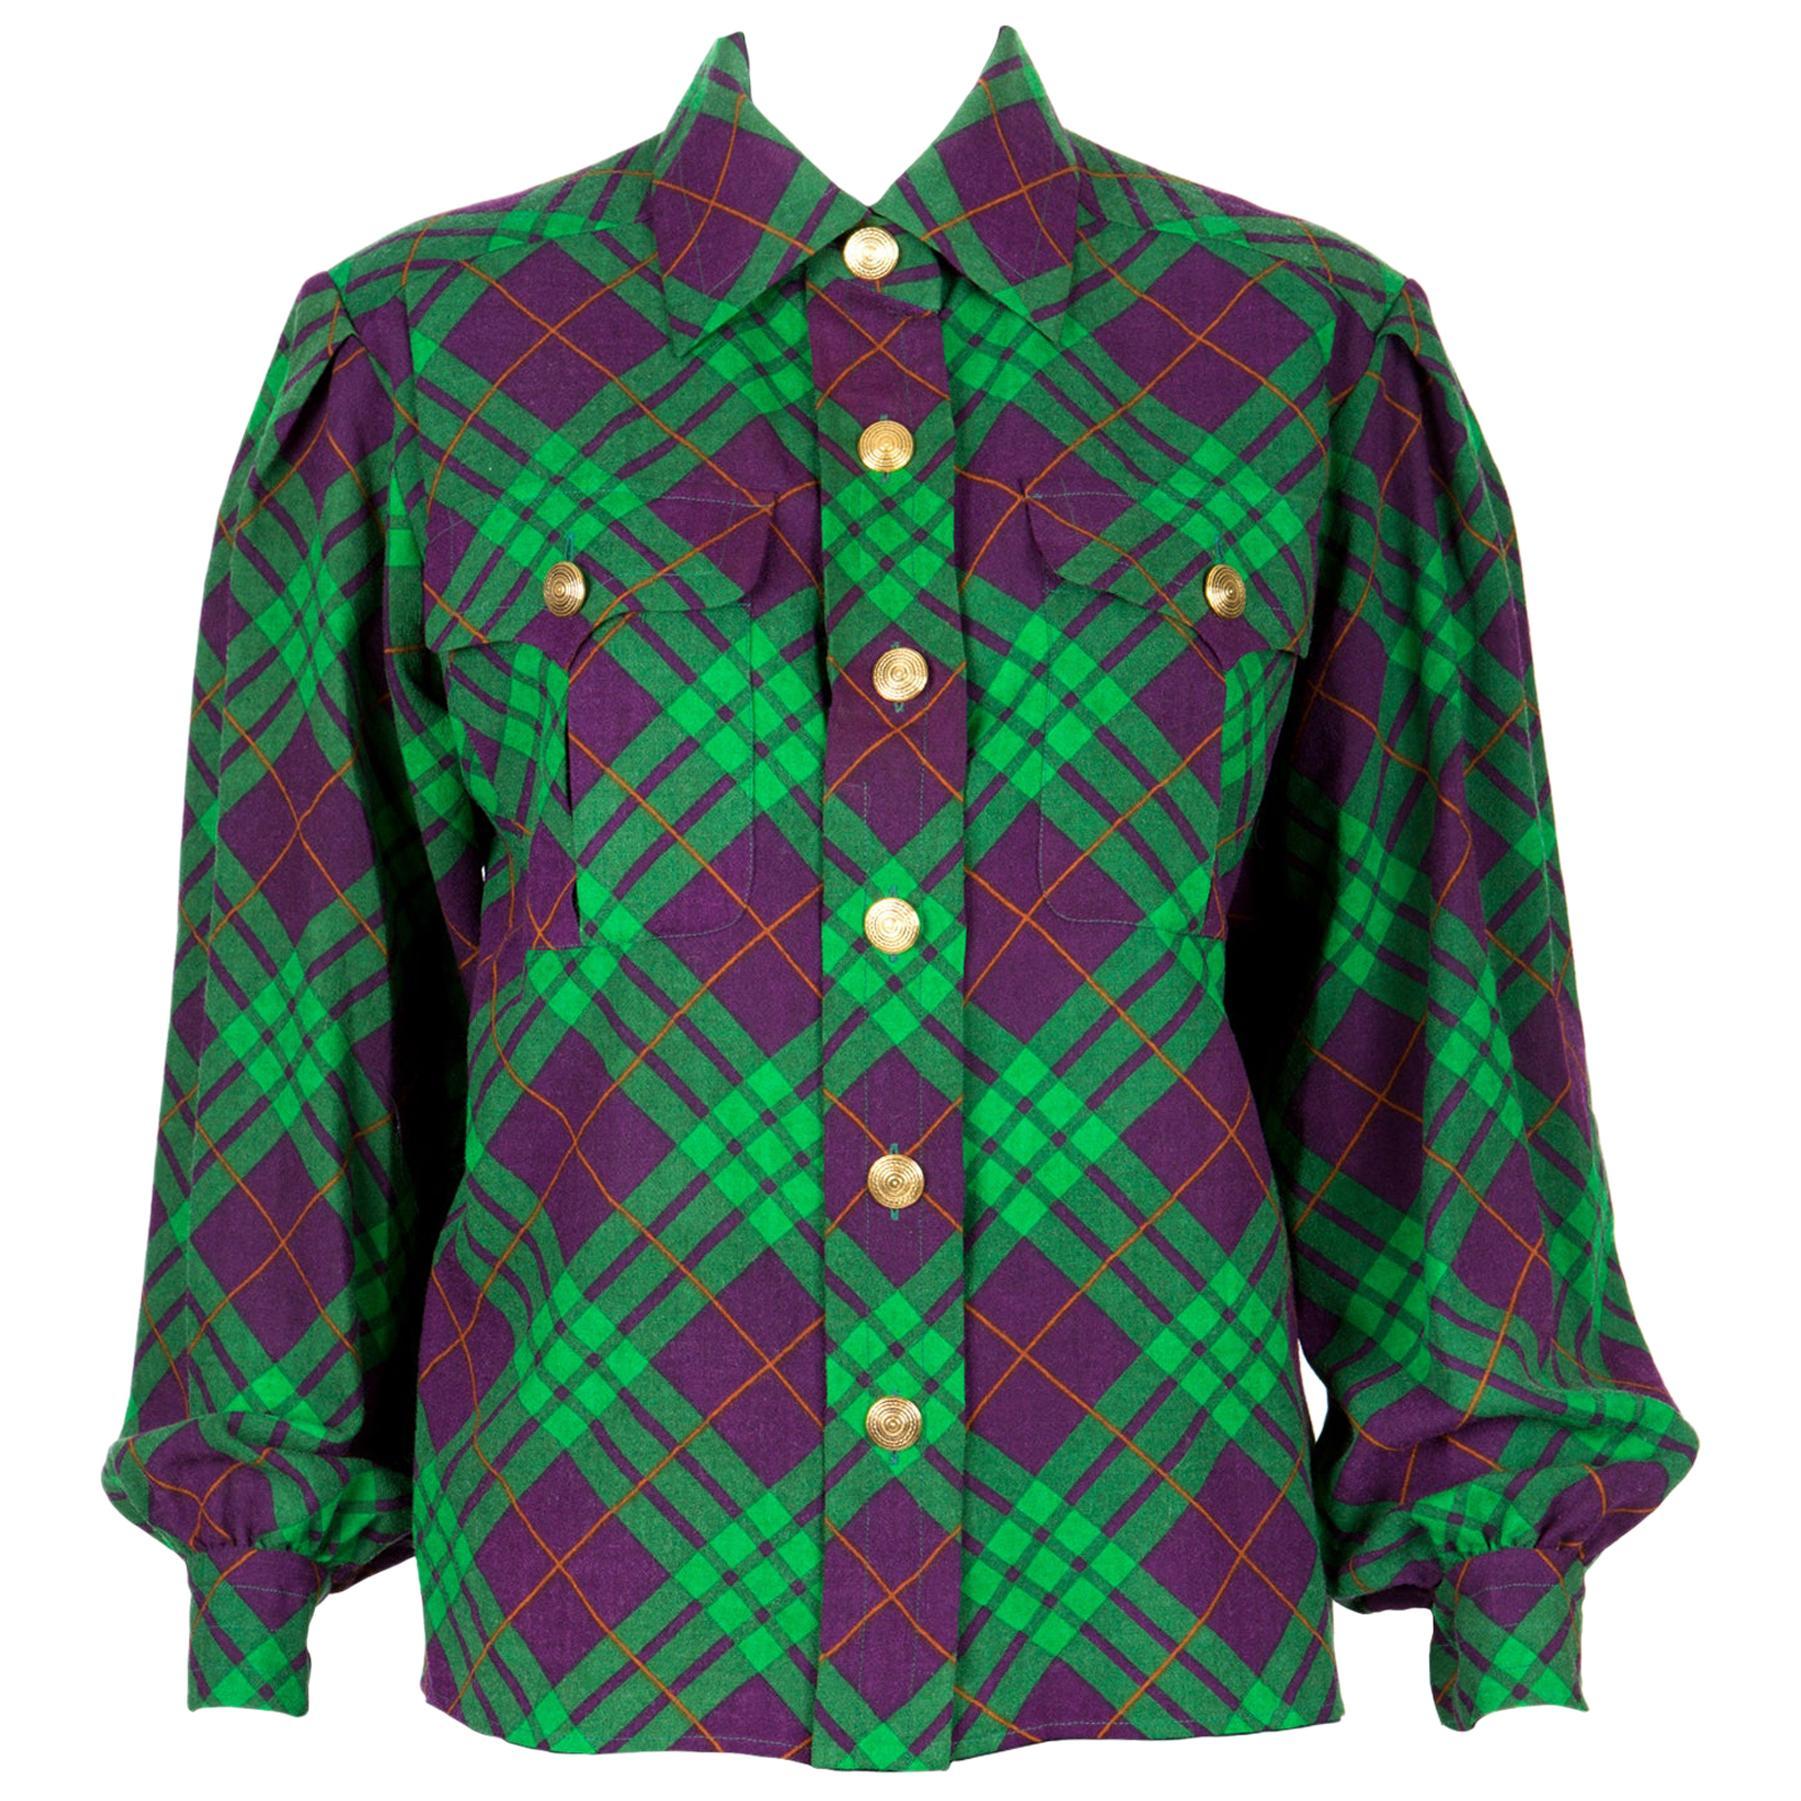 Yves Saint Laurent Check Wool Shirt Jacket